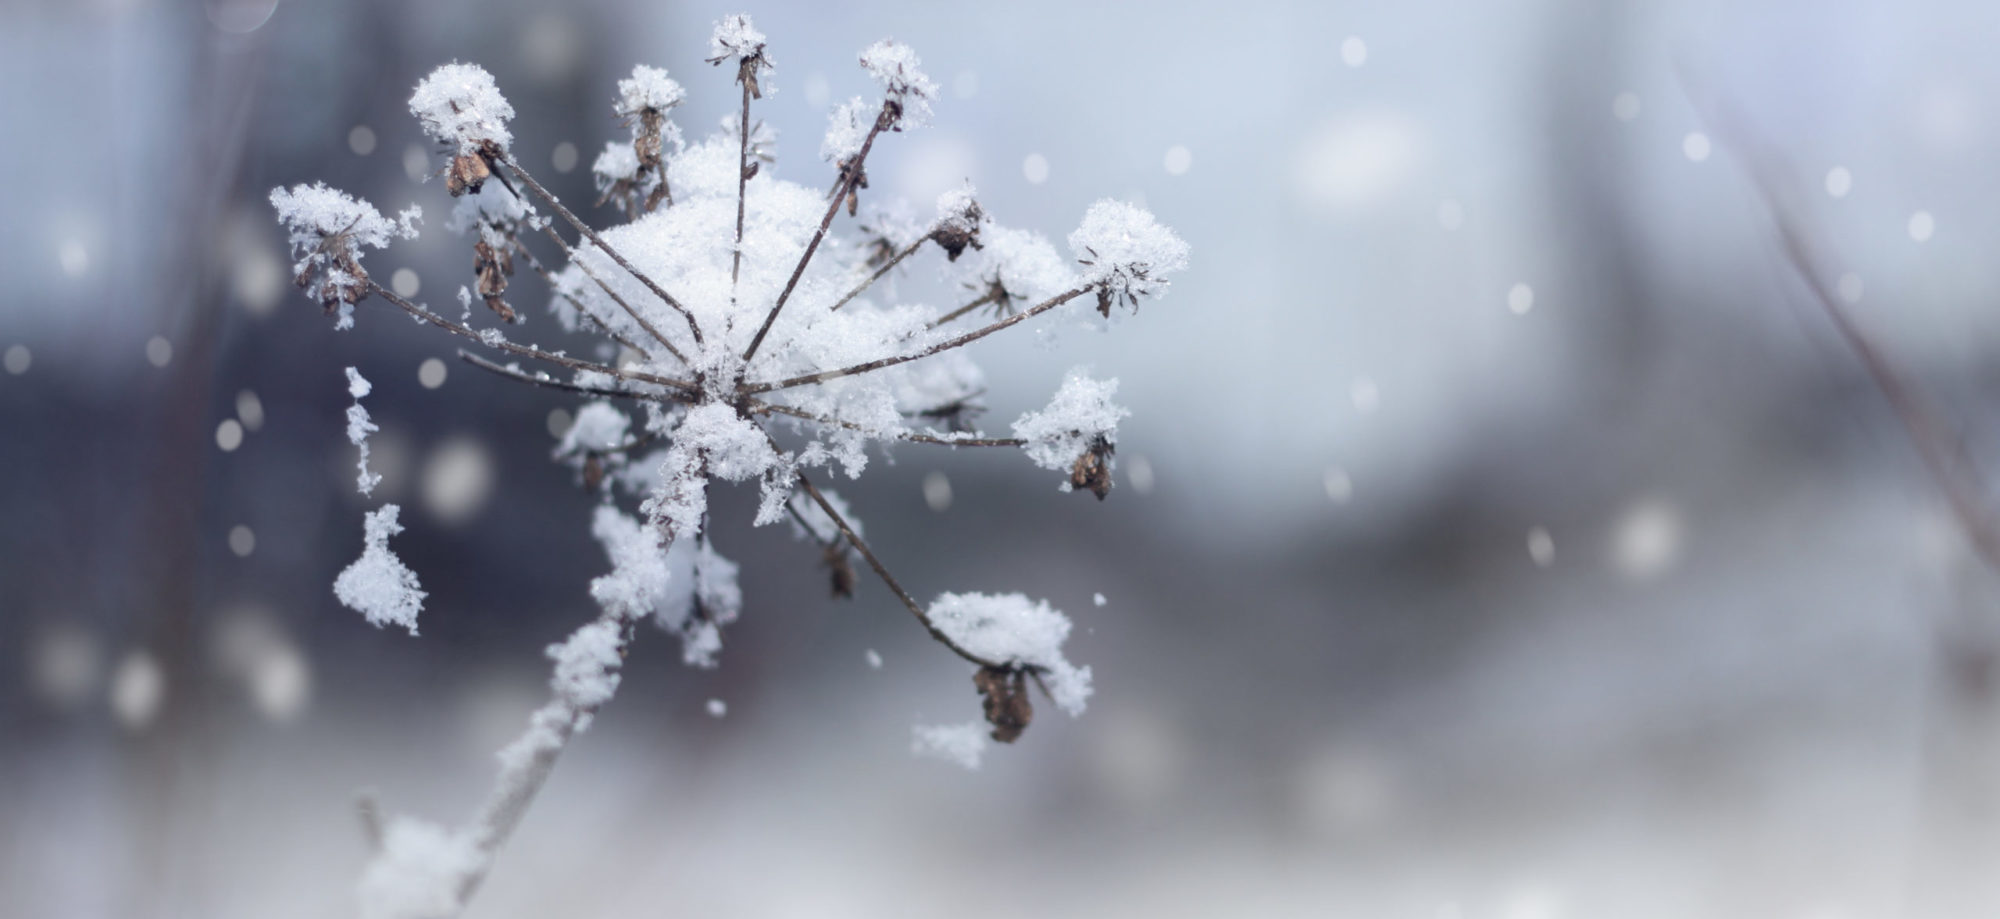 Entretien des jardins en zone froide